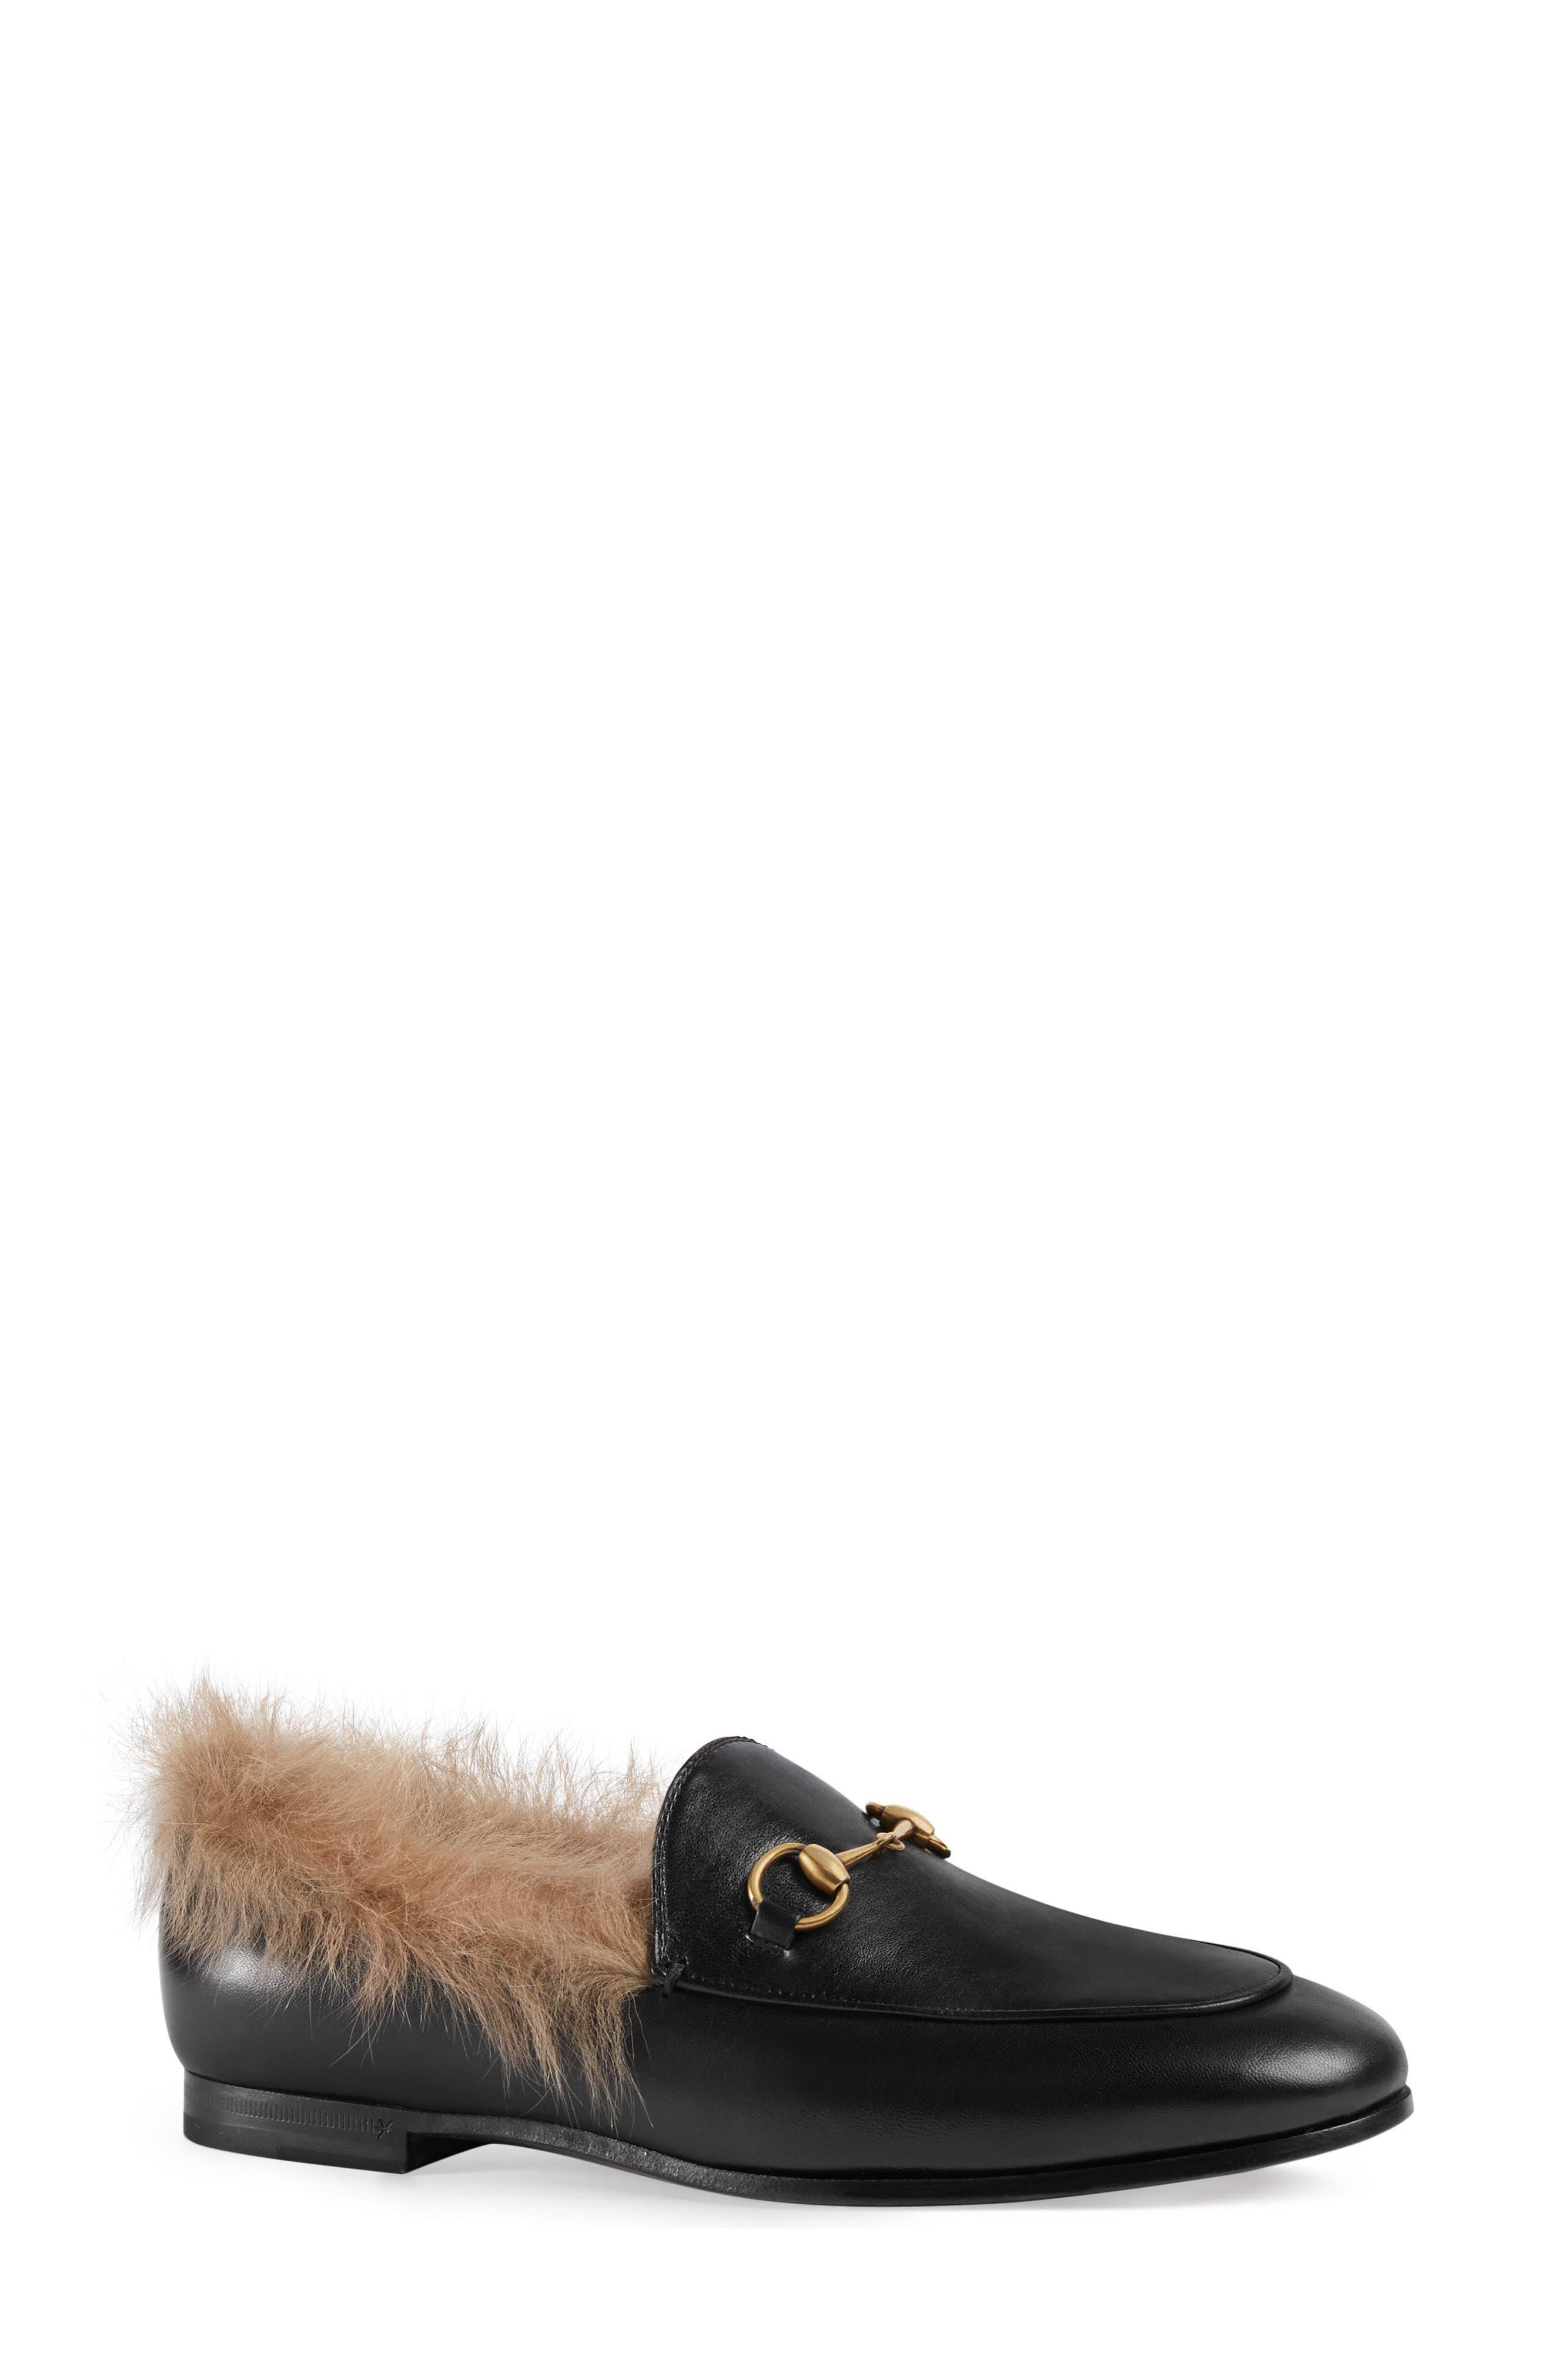 GUCCI Jordaan Genuine Shearling Lining Loafer, Main, color, BLACK